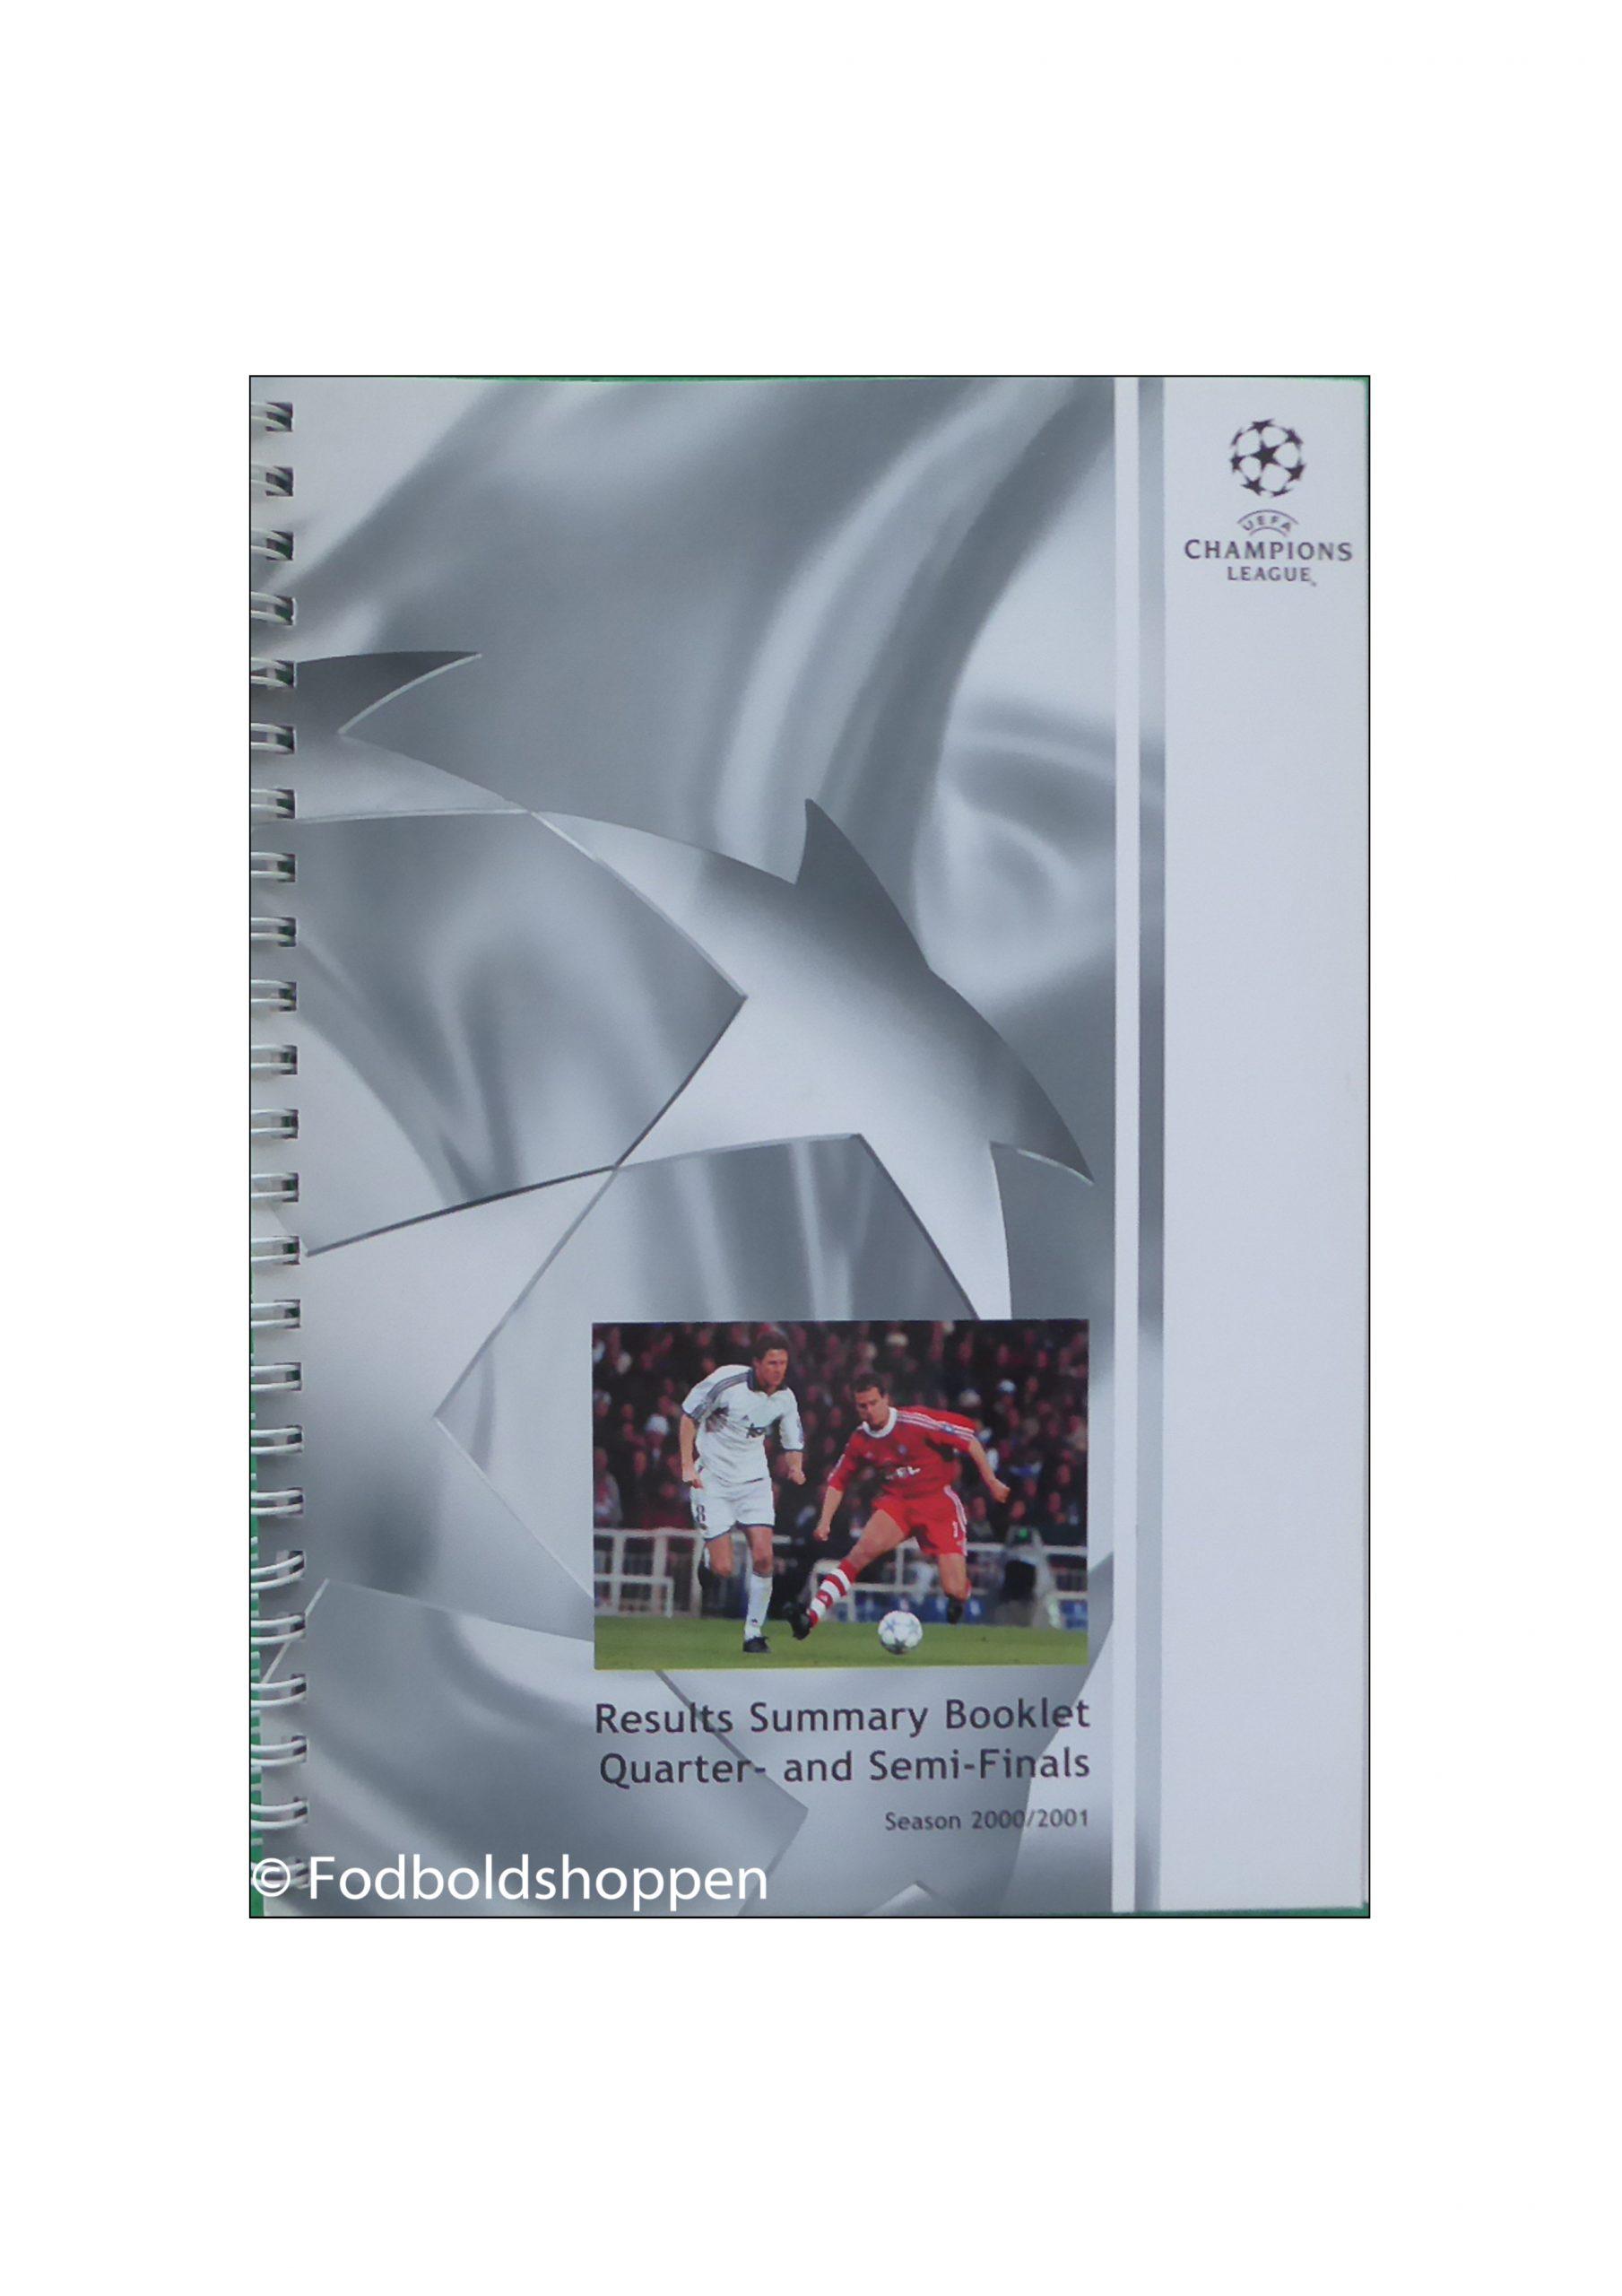 Champions League Results Summary 1/4 & Semi-finals 2000/01